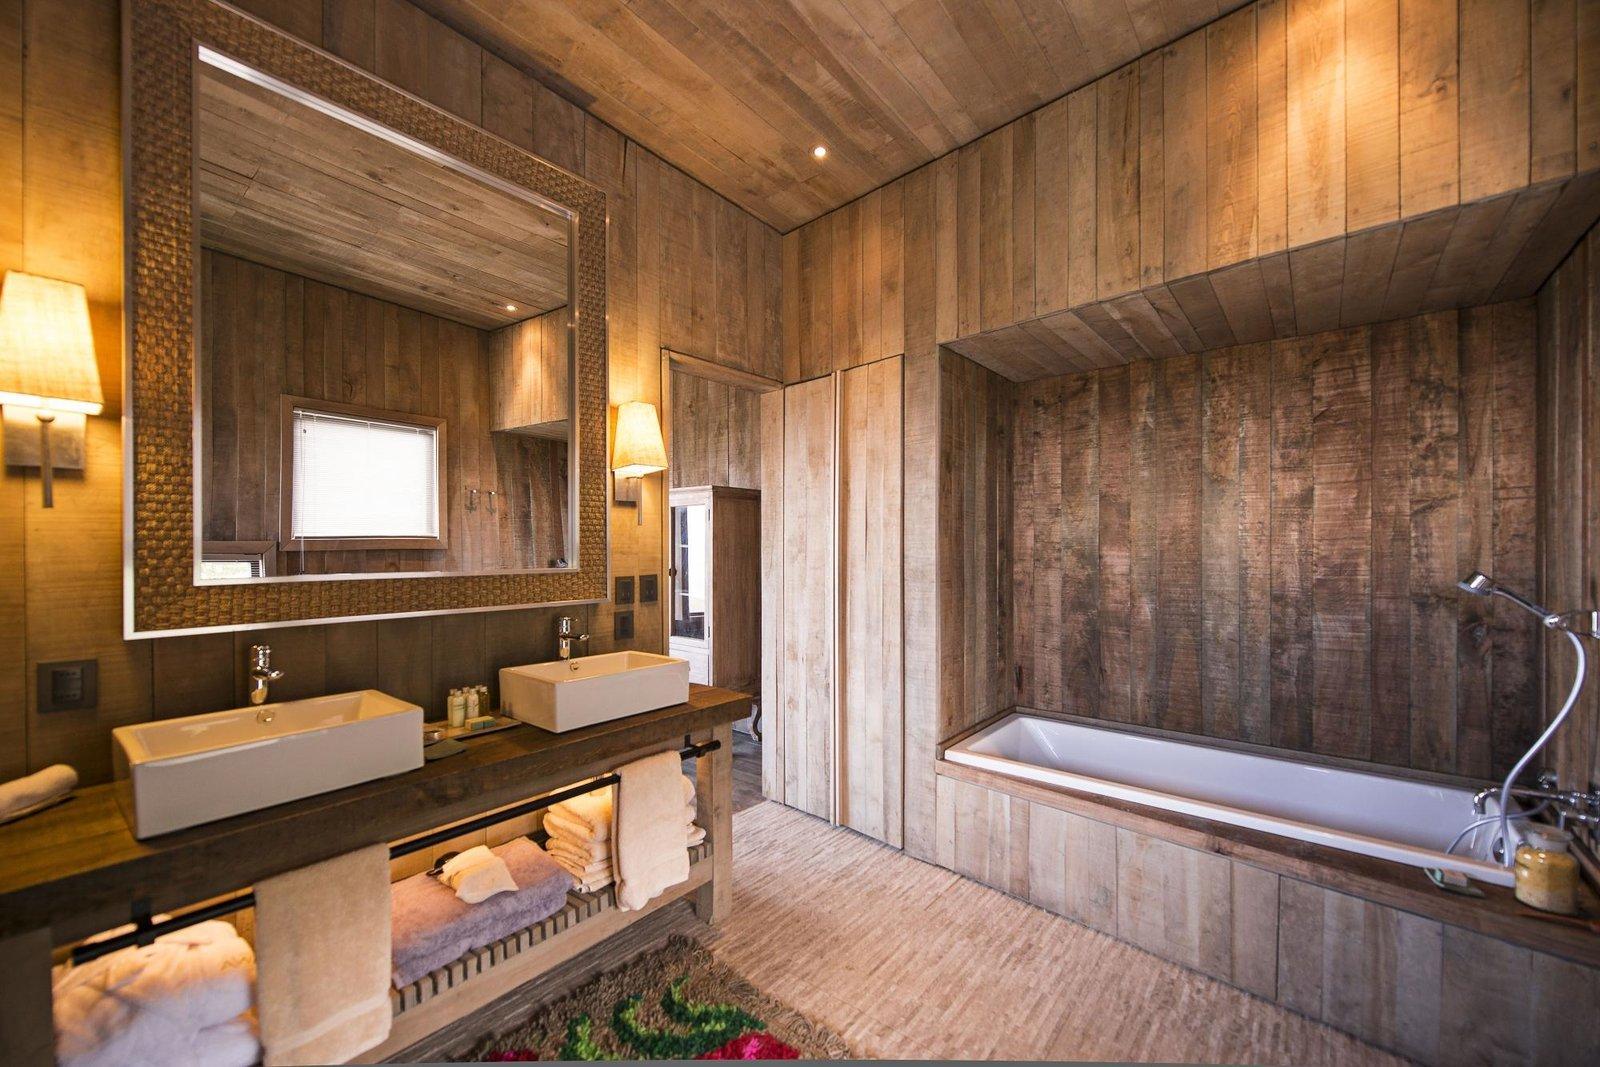 Bath Room, Vessel Sink, Alcove Tub, Wall Lighting, Recessed Lighting, and Wood Counter  Awasi Patagonia